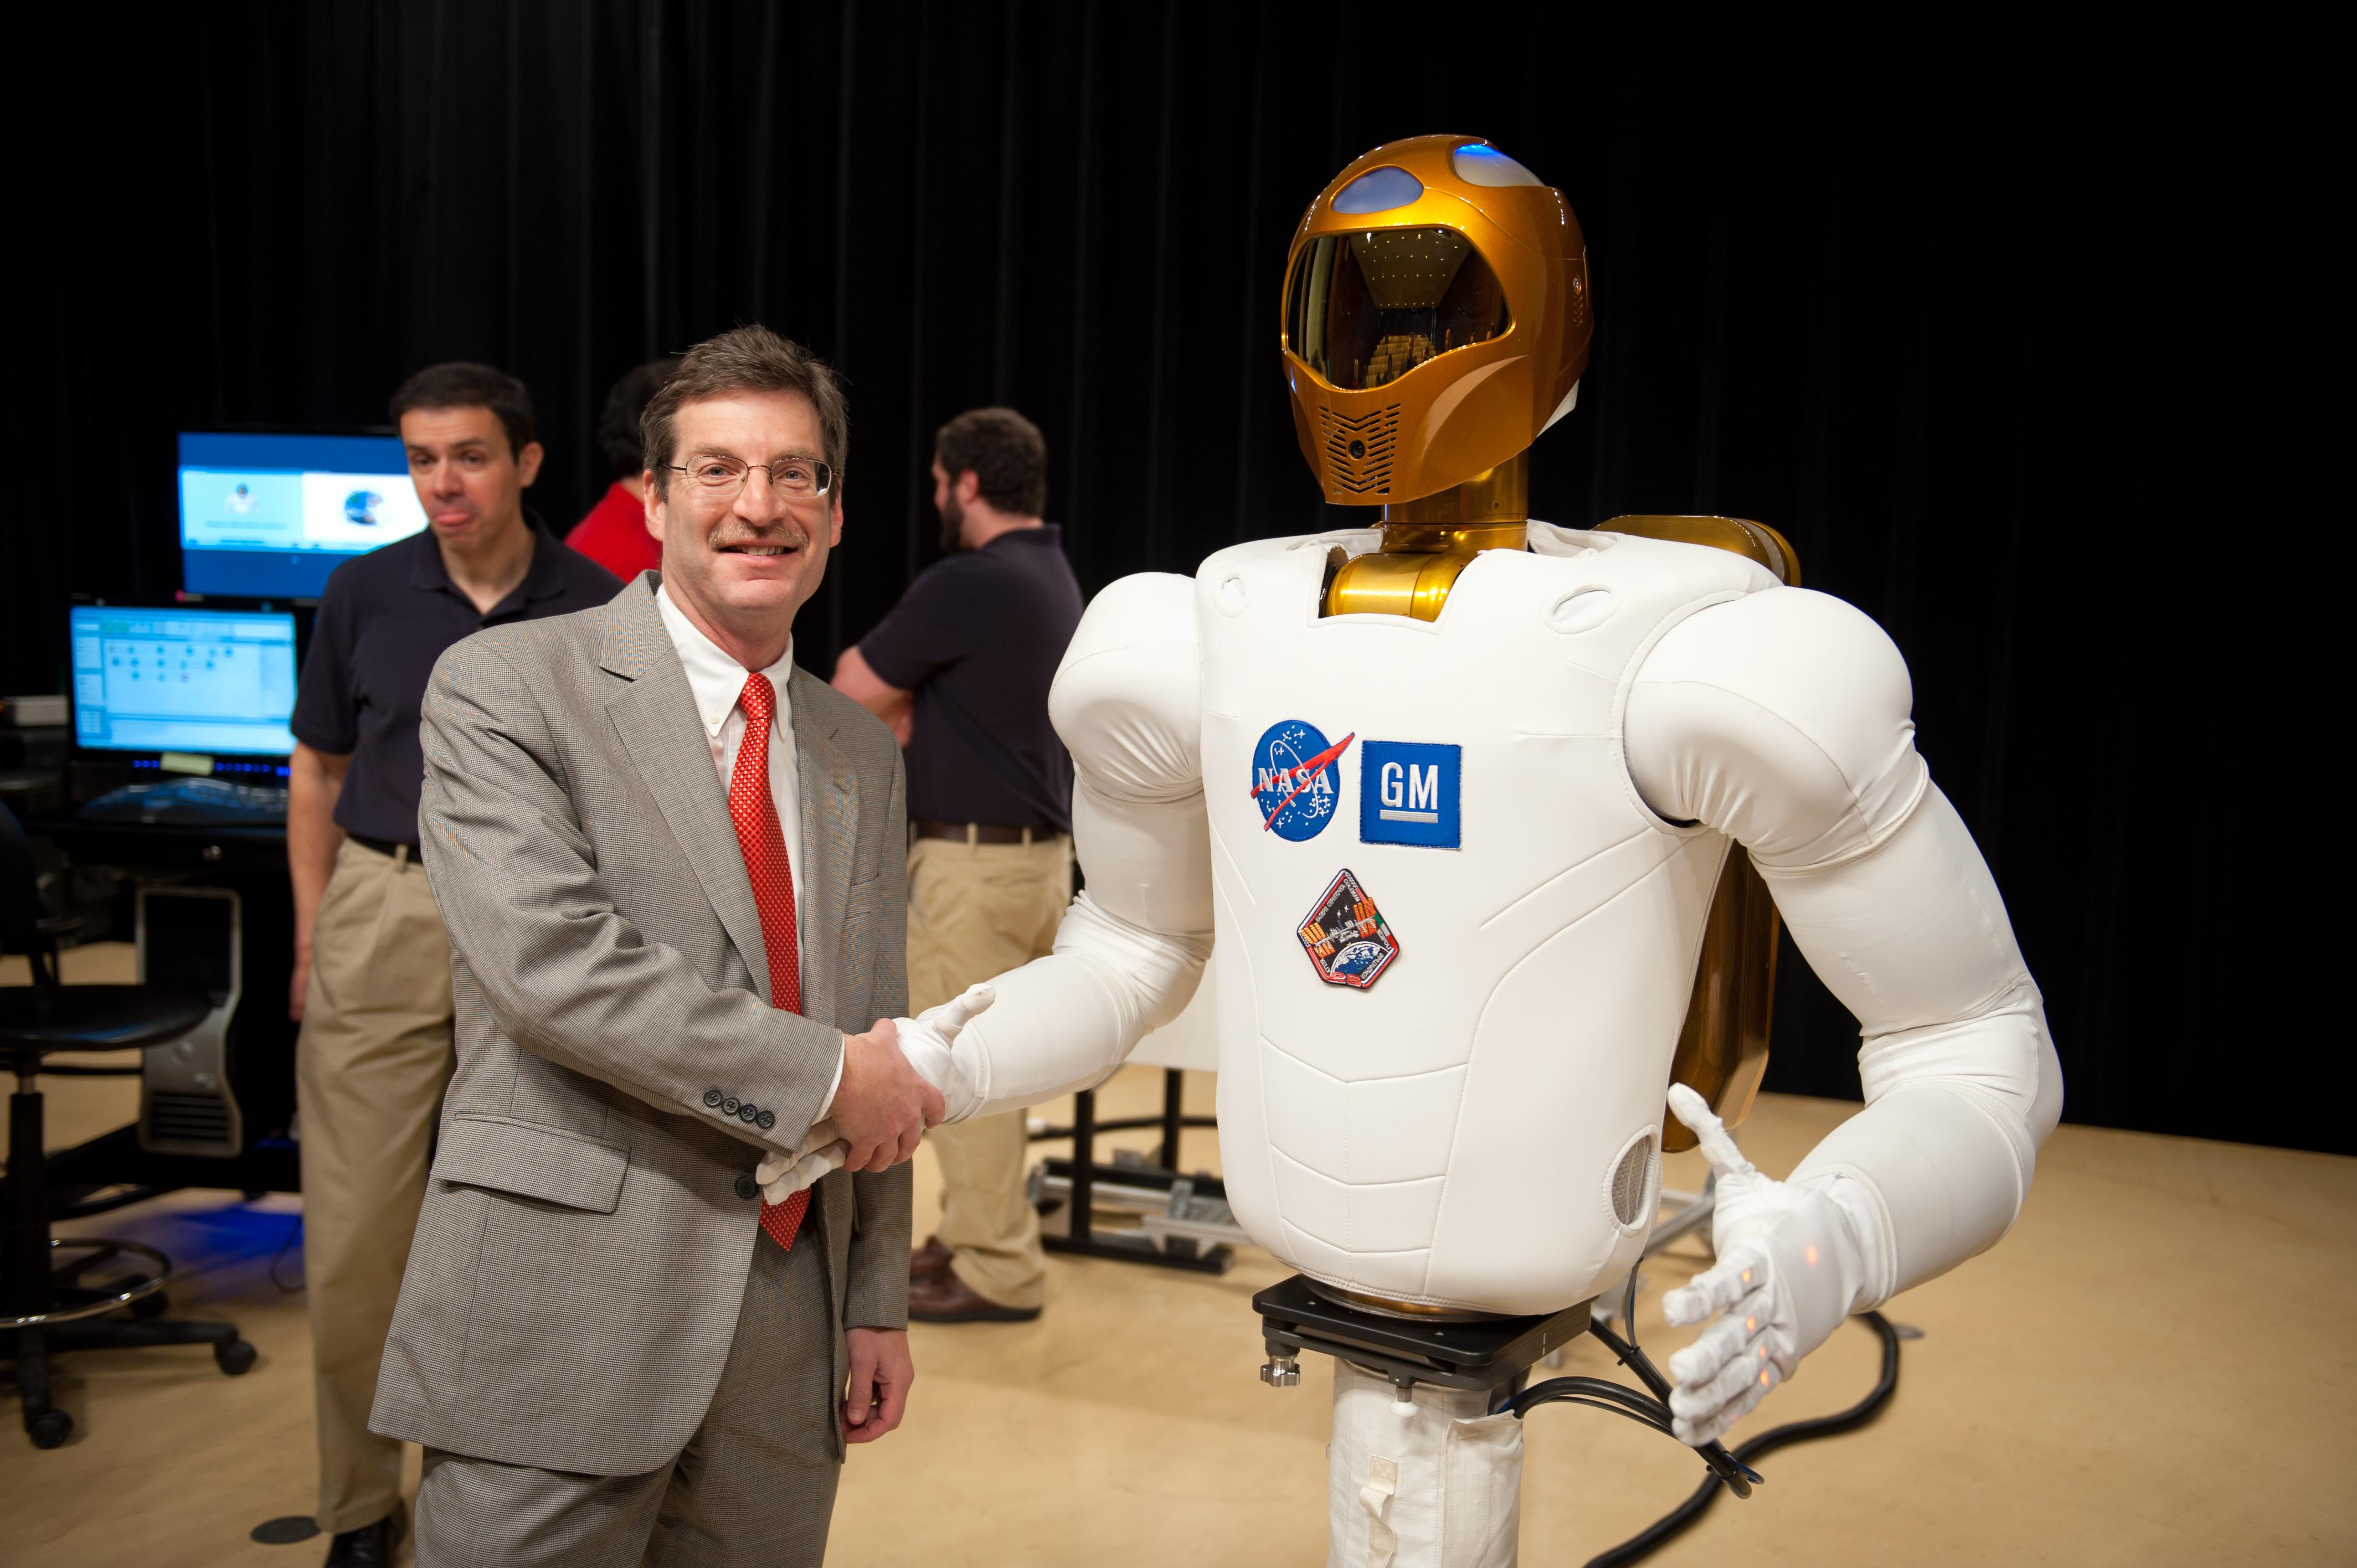 roboticsindustryassoc-president-jeff-burnstein-shakes-hands-with-gm-nasa-robonaut-2.jpg